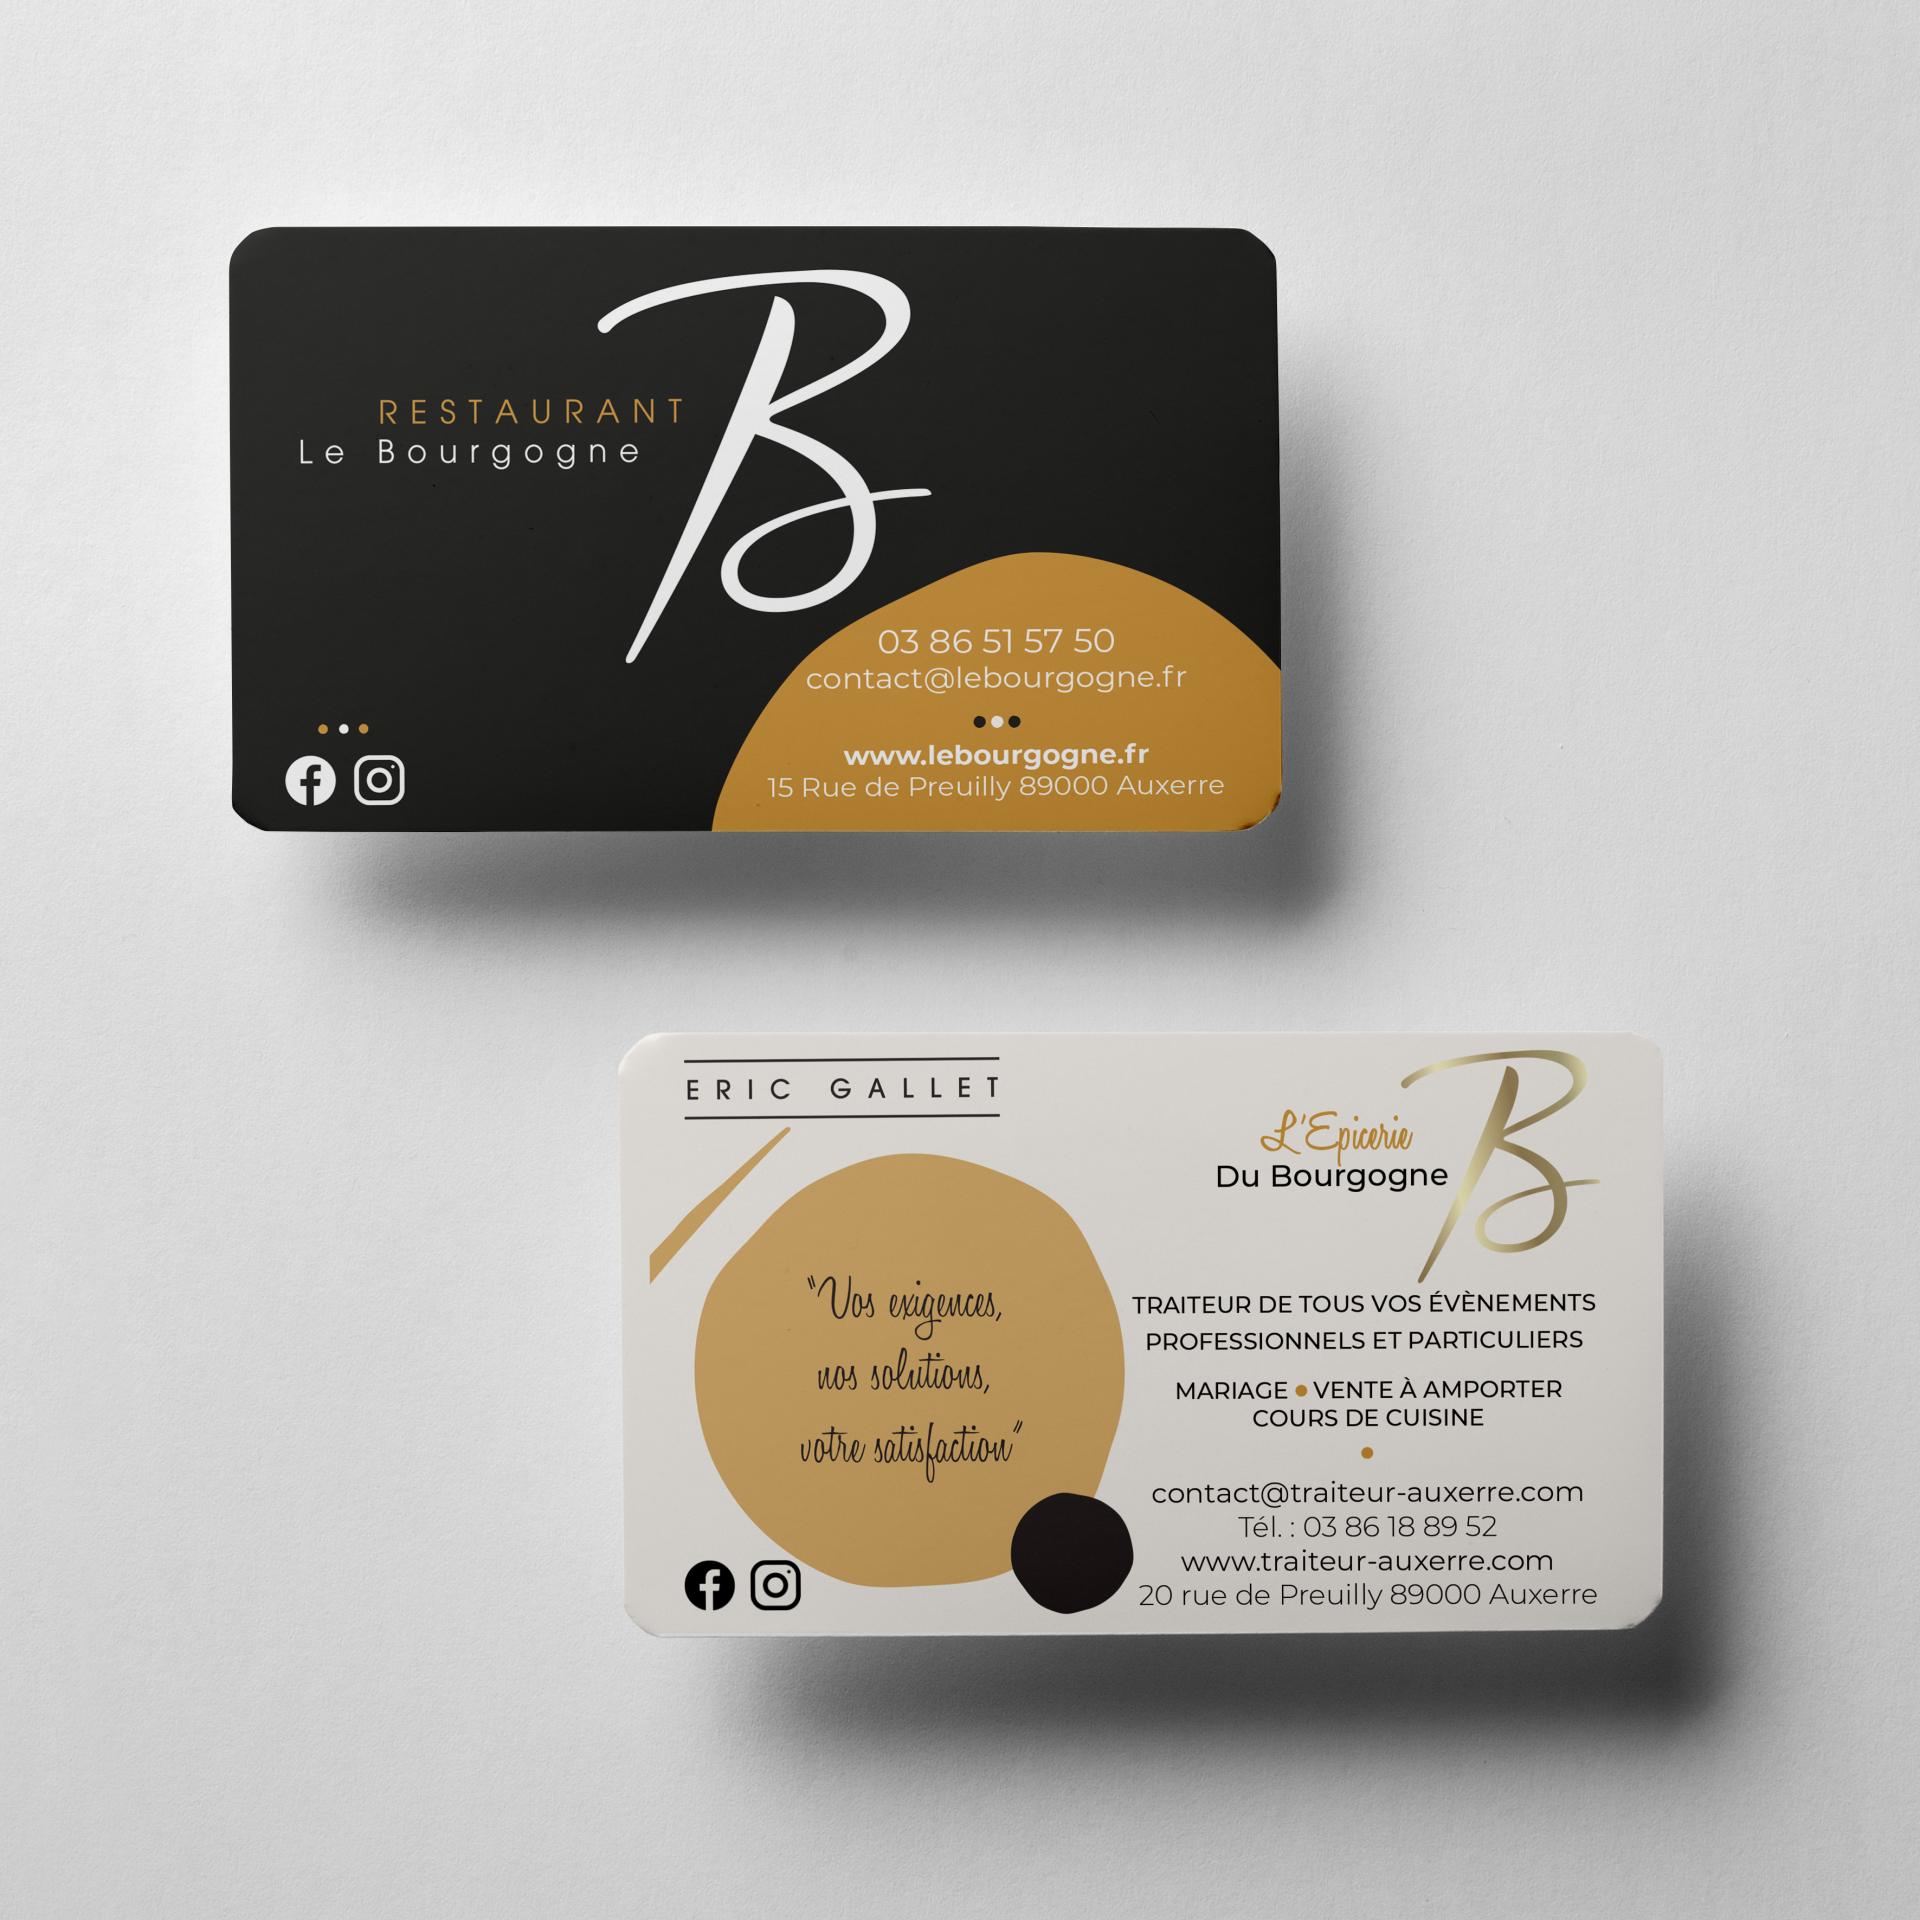 Cartes de visite Epicerie du Bourgogne & Restaurant Le Bourgogne